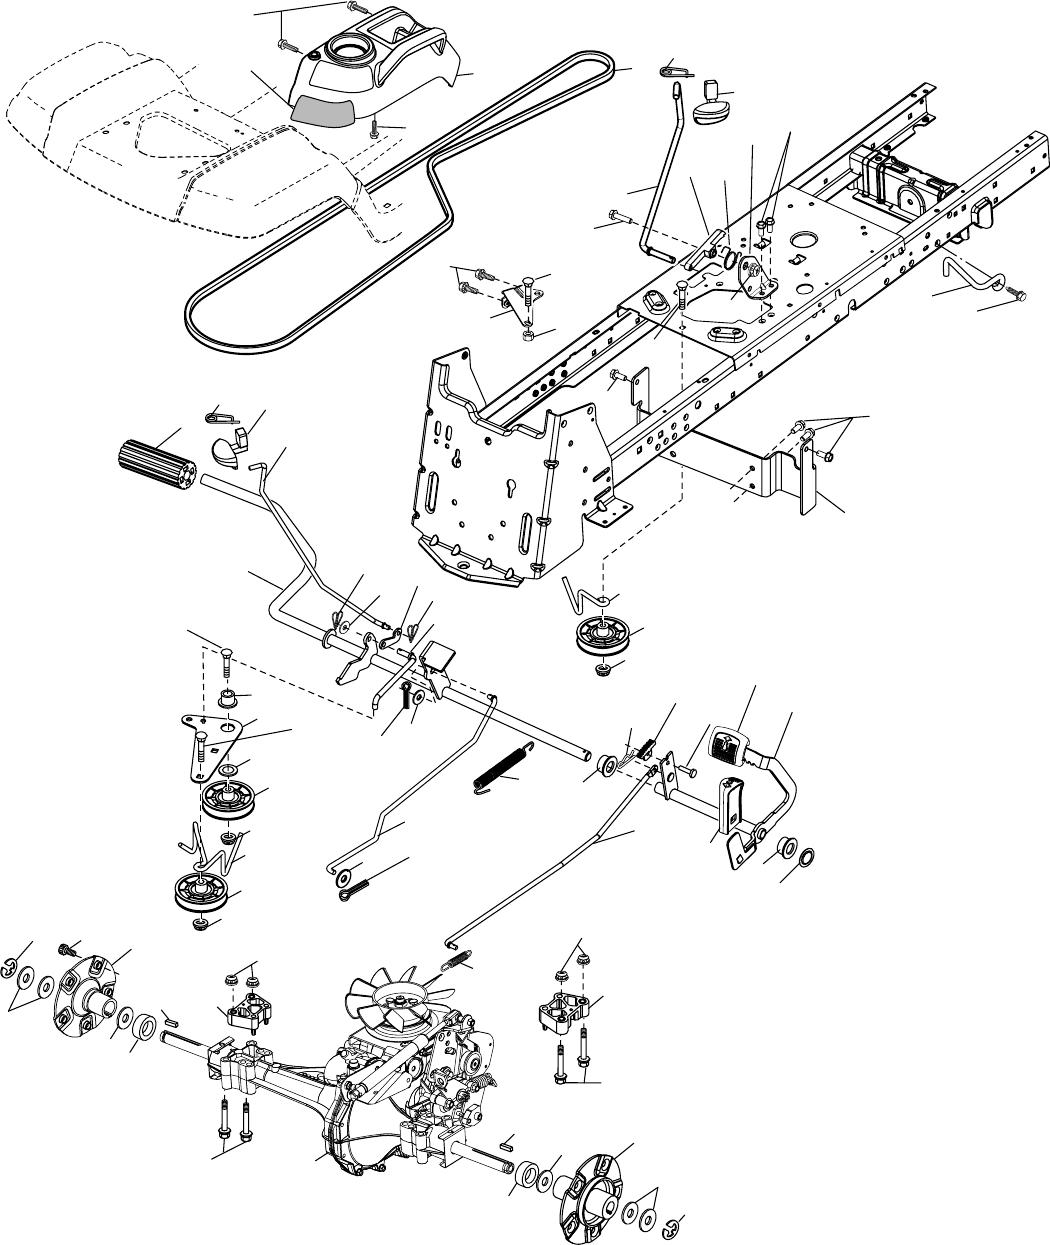 Husqvarna Gth26K54T Users Manual OM, GTH 26 K 54 T